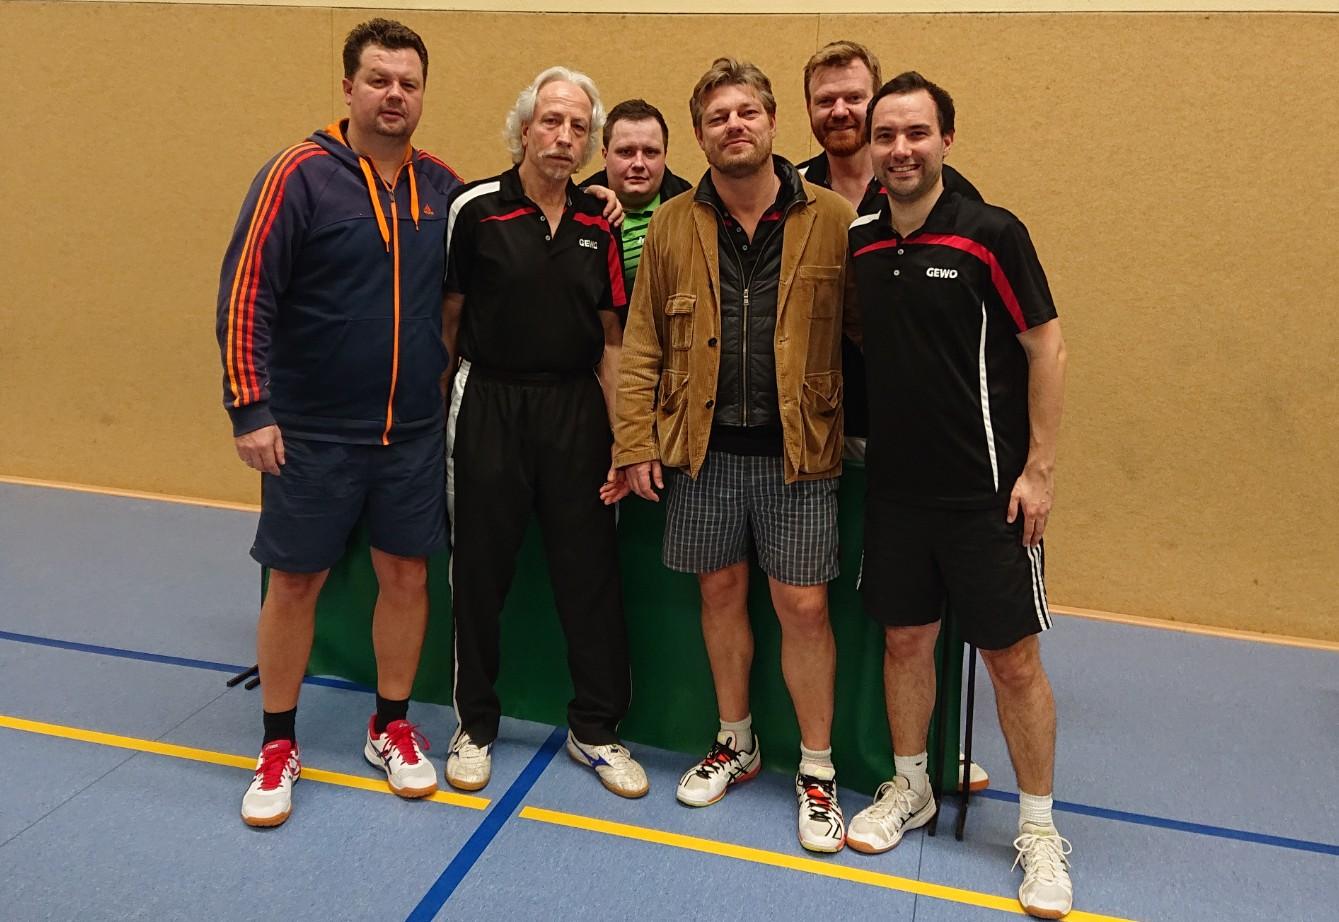 Manuel Klust, Dieter Lietmann, Mathias Lehnick, Björn Ungruhe, Matthias Wildhagen, Sebastian Meyer